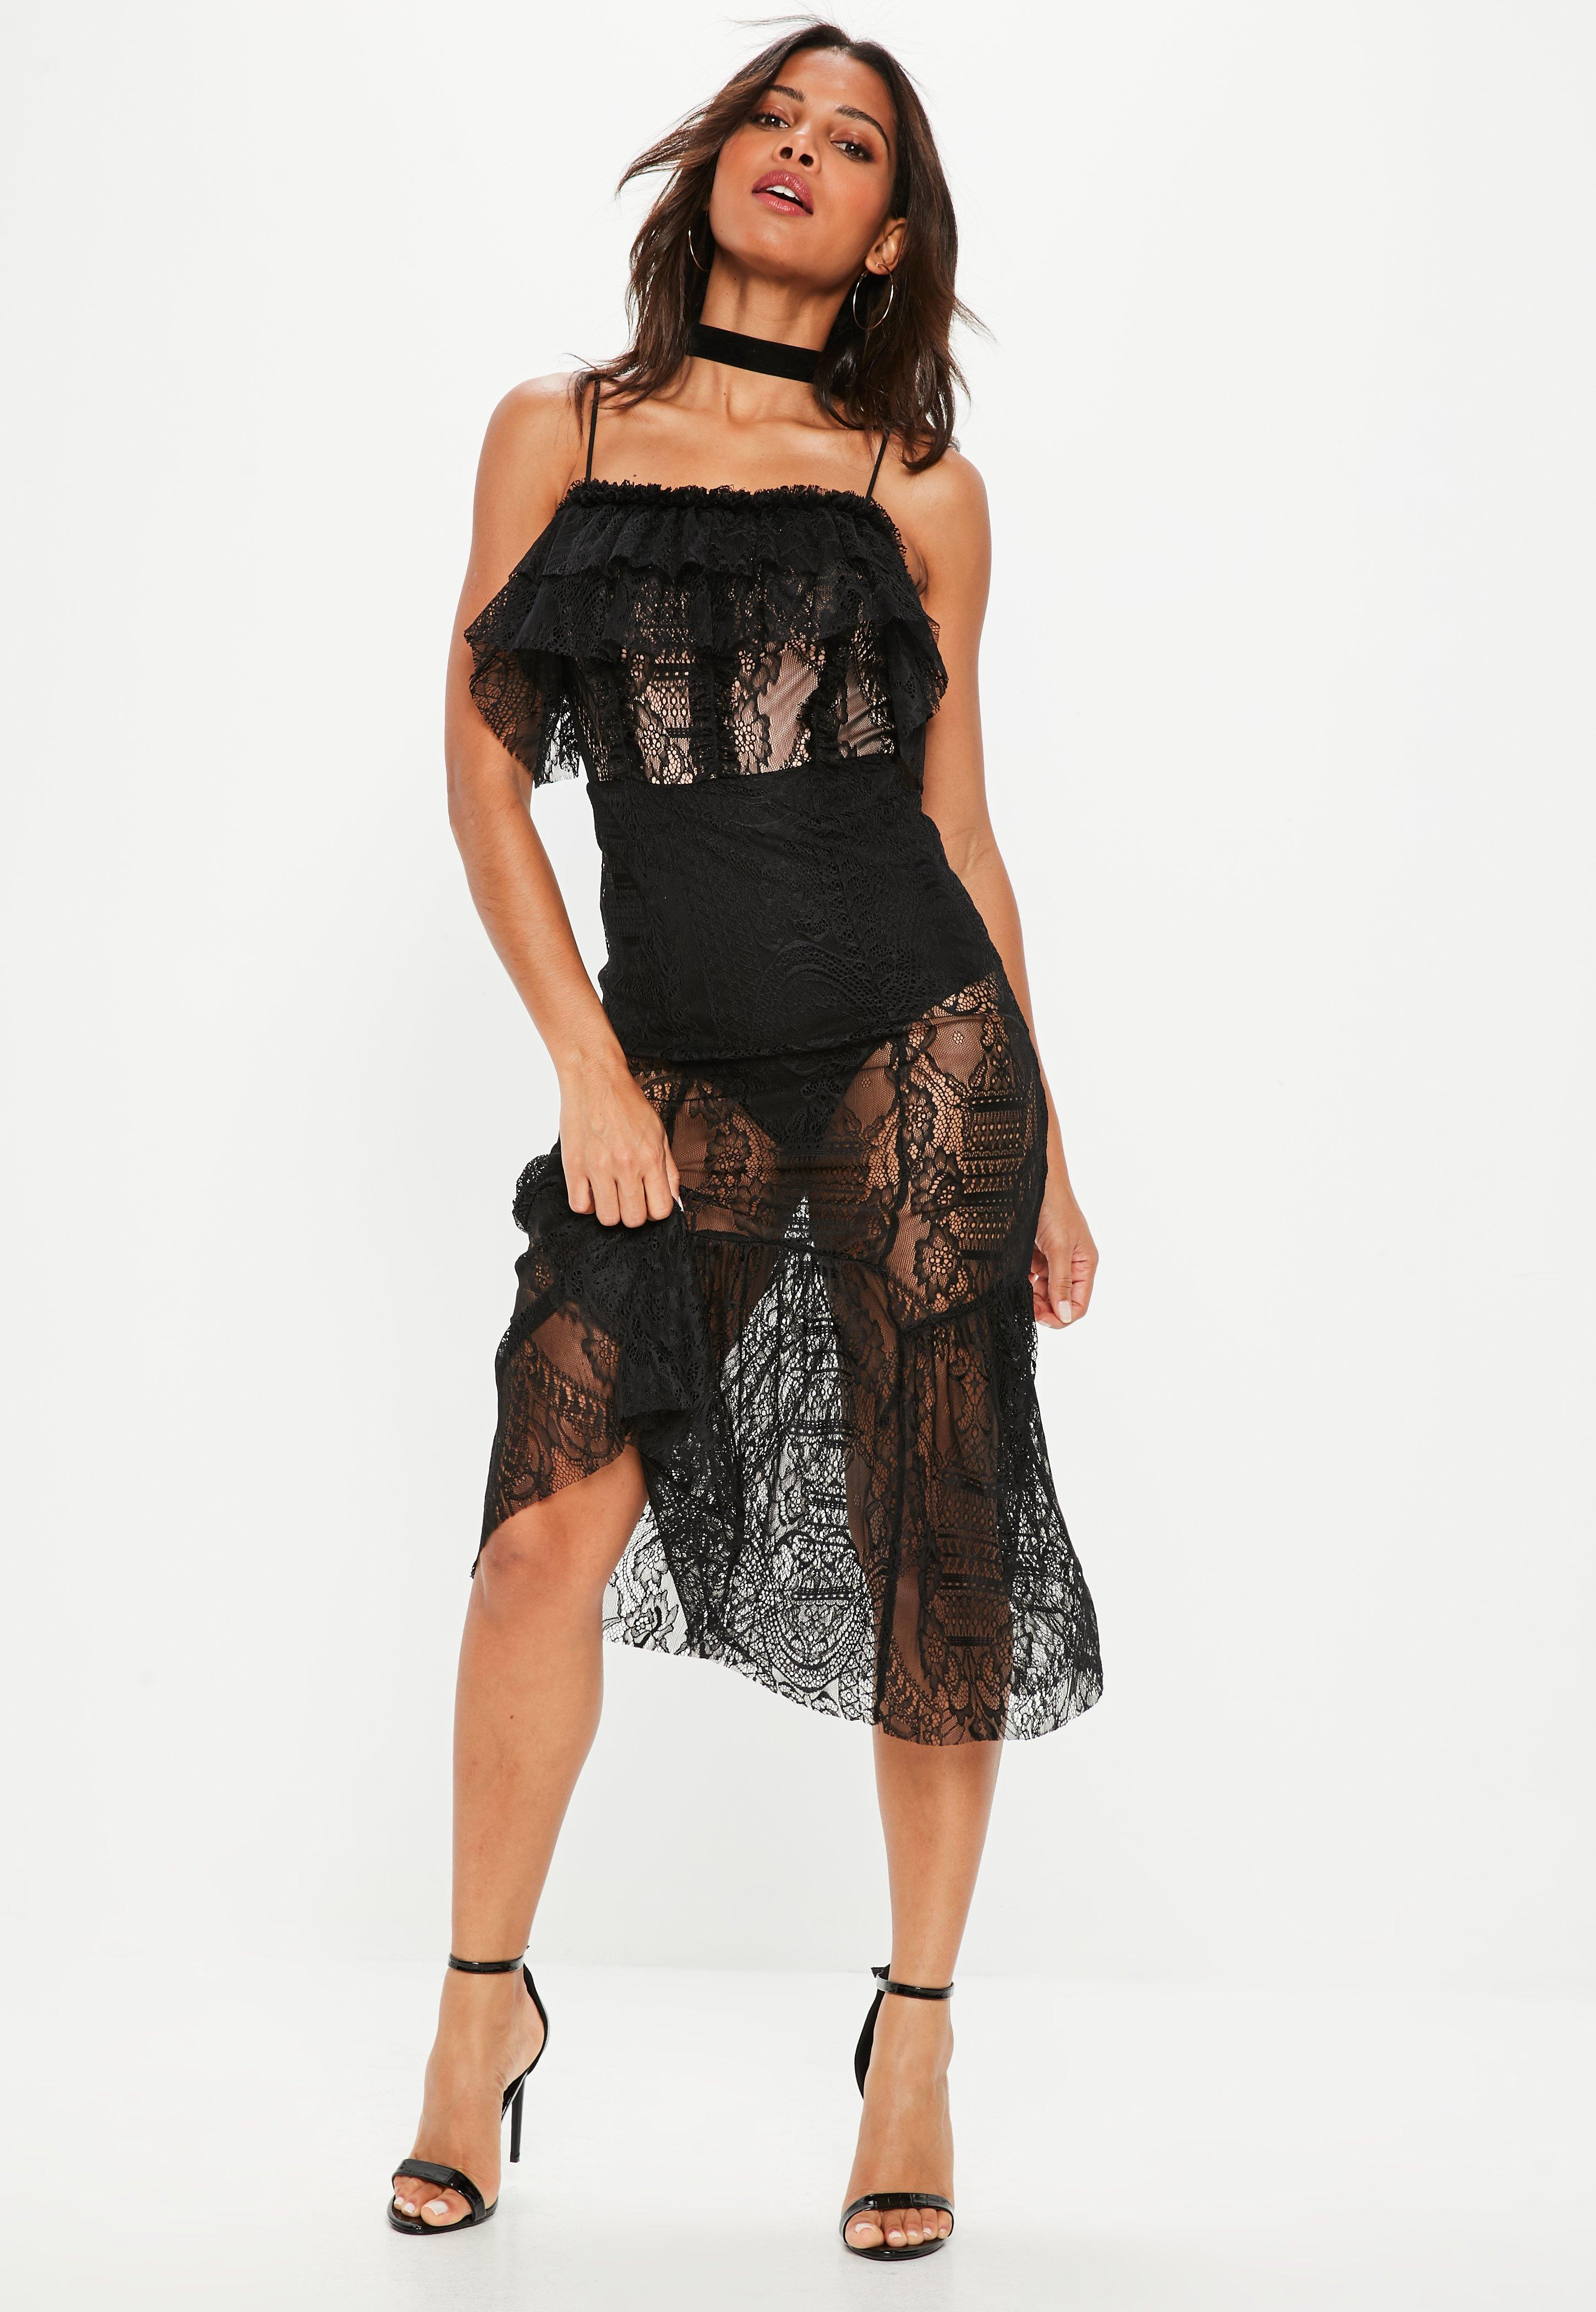 Black lace overlay puffy dress